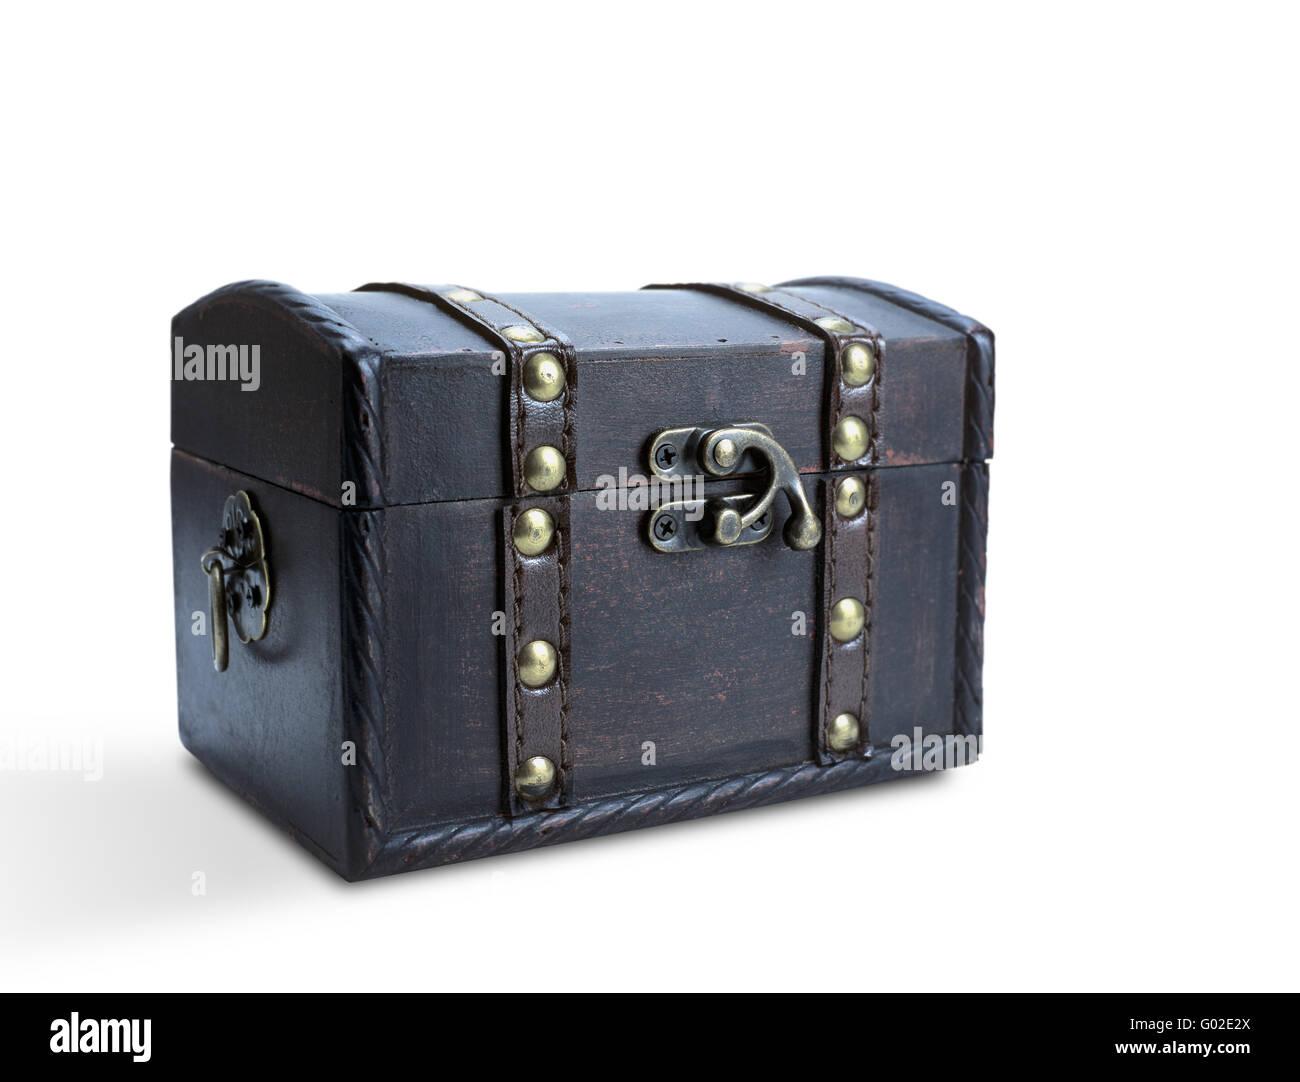 Jewelry Box - Stock Image